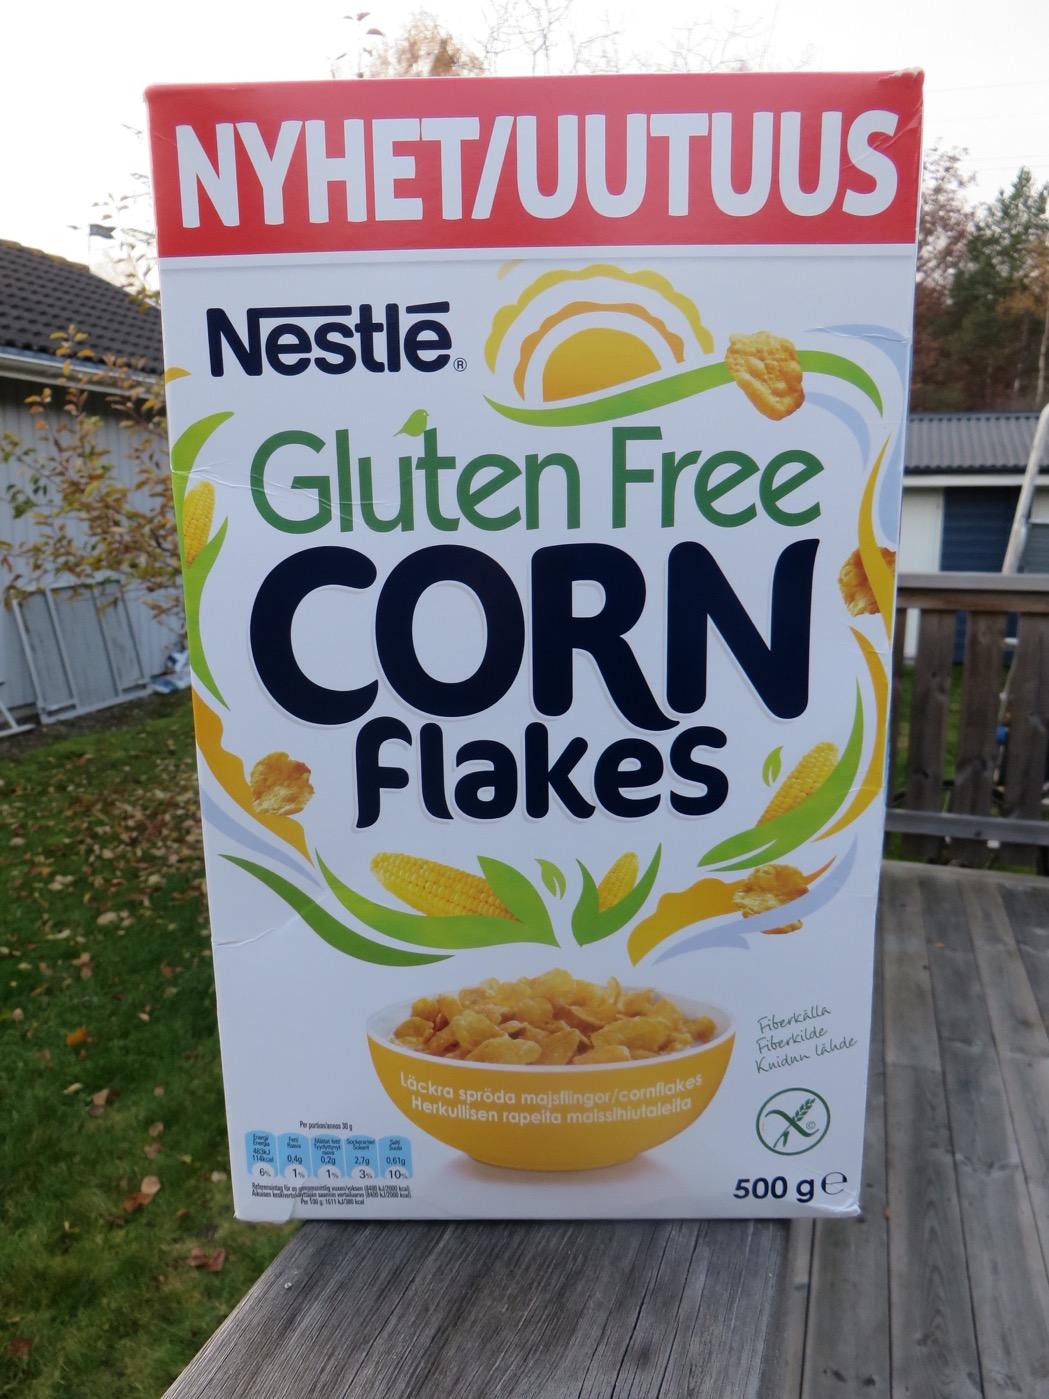 innehåller cornflakes gluten